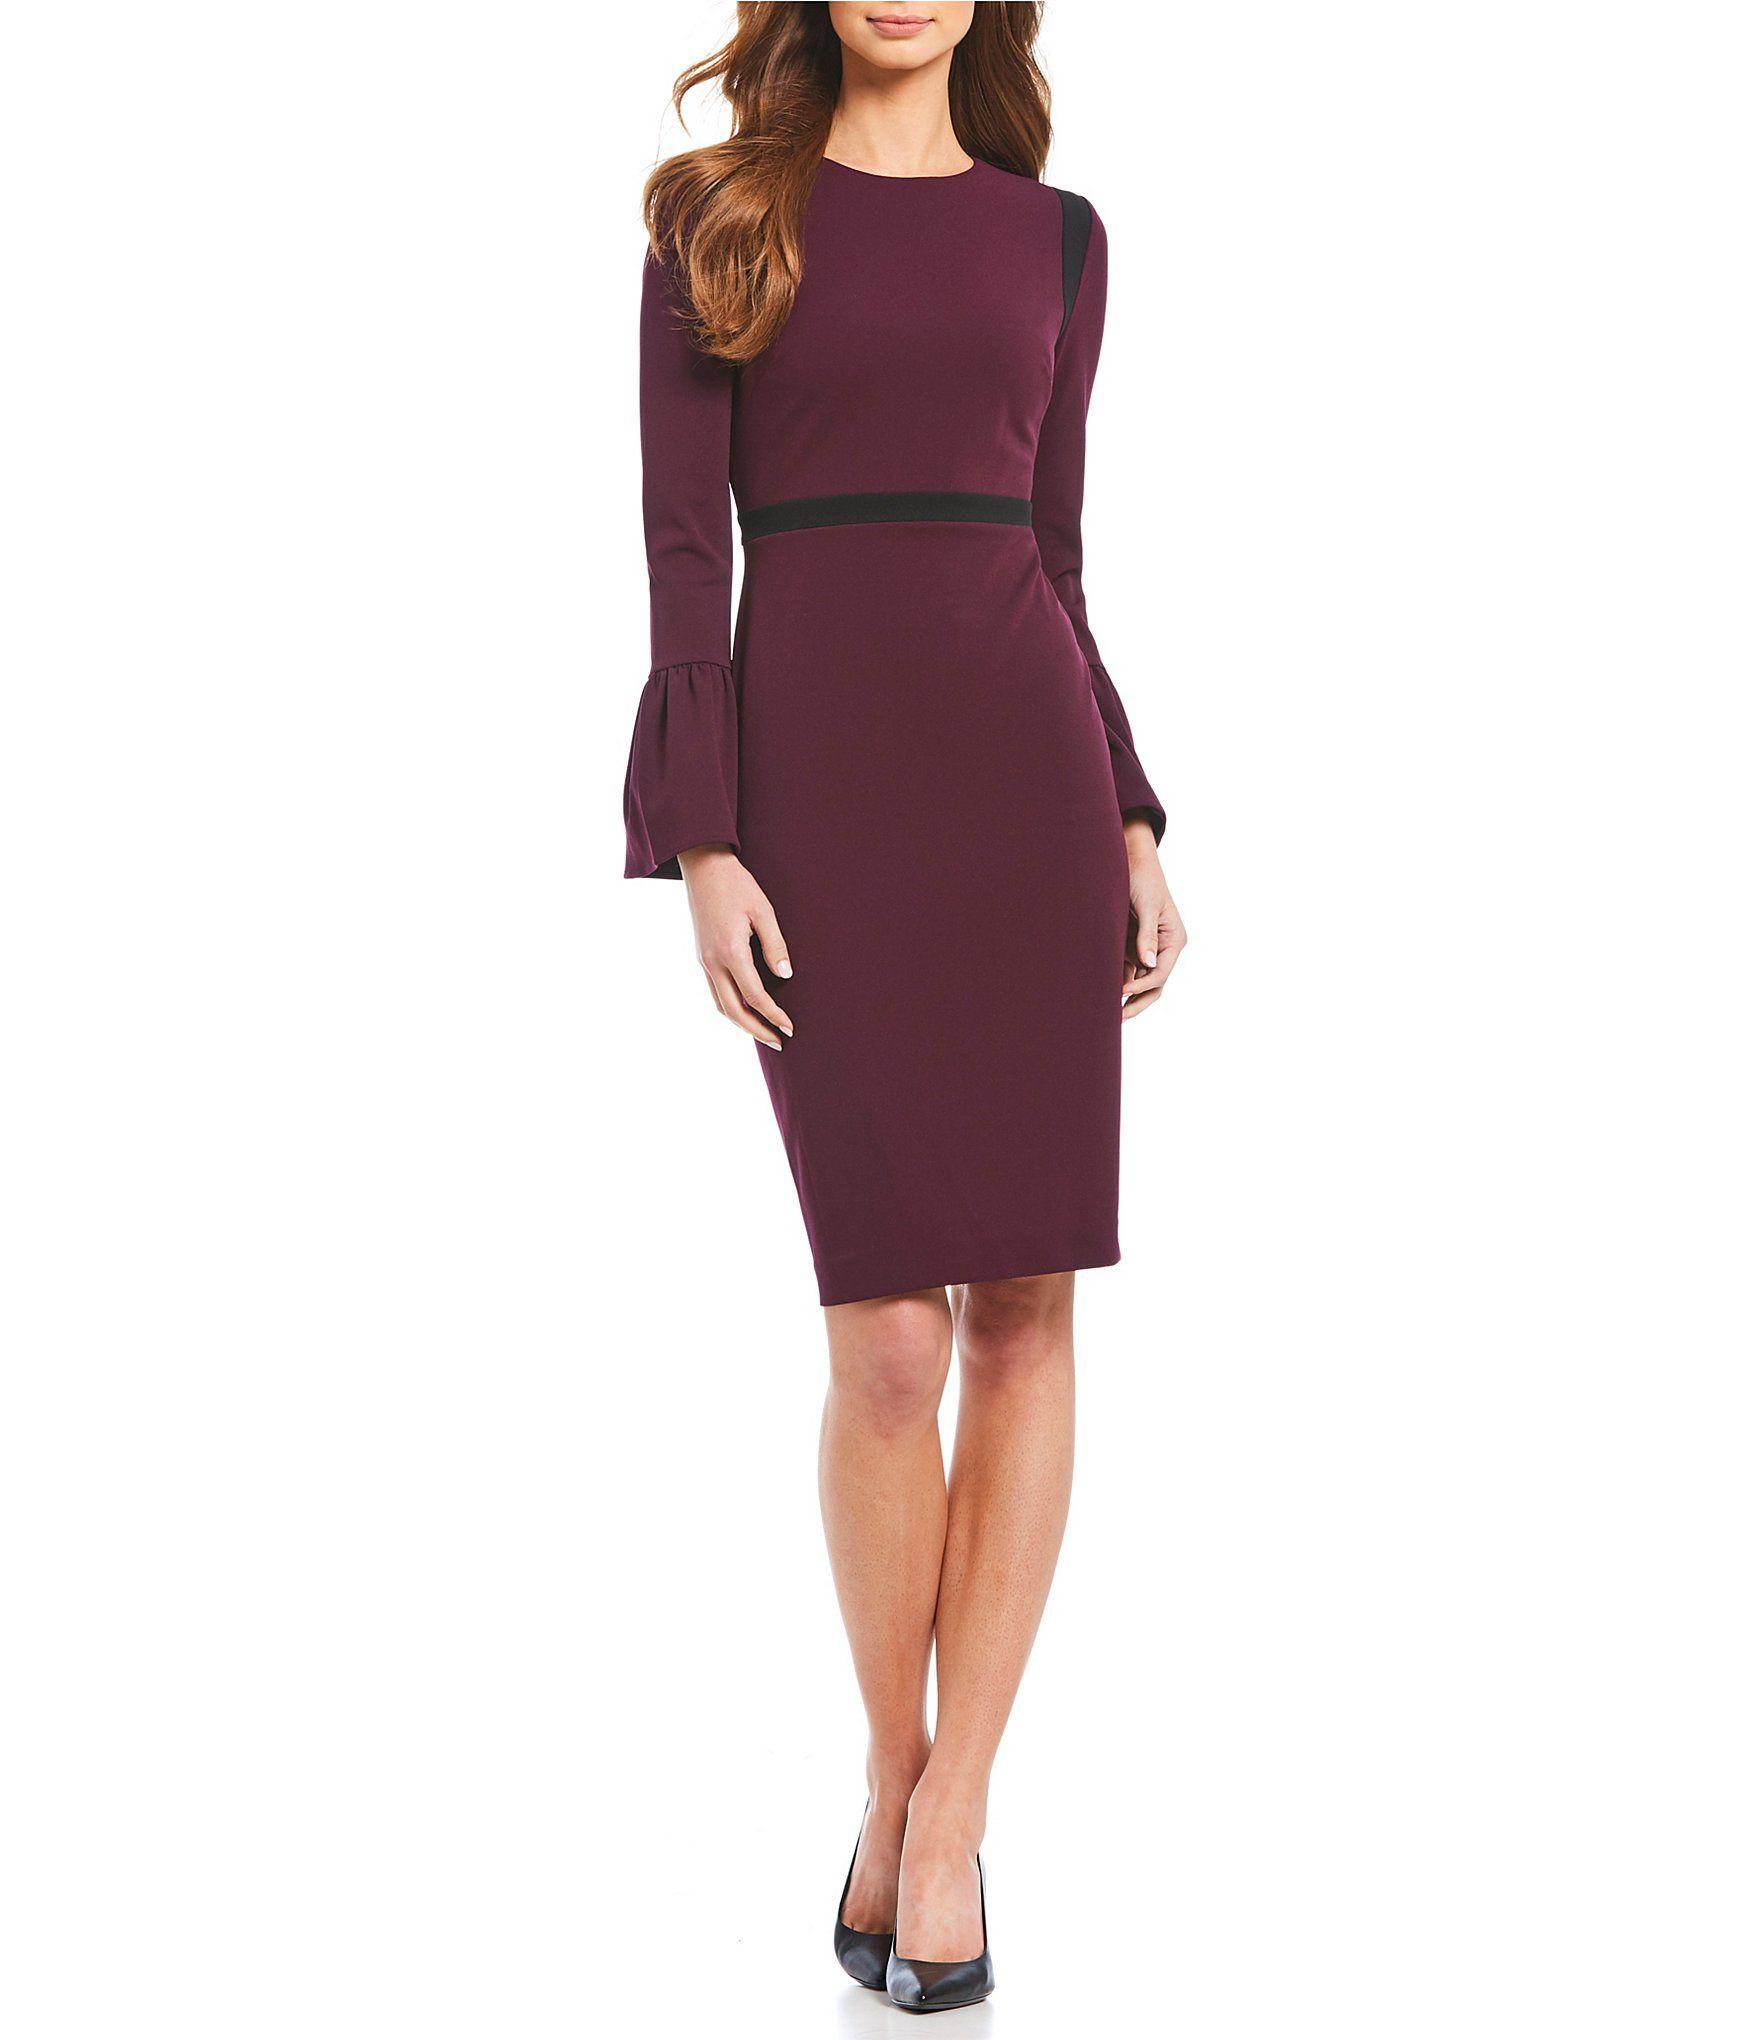 58ac53ef166 Shop for Calvin Klein Bell Sleeve Sheath Dress at Dillards.com. Visit  Dillards.com to find clothing